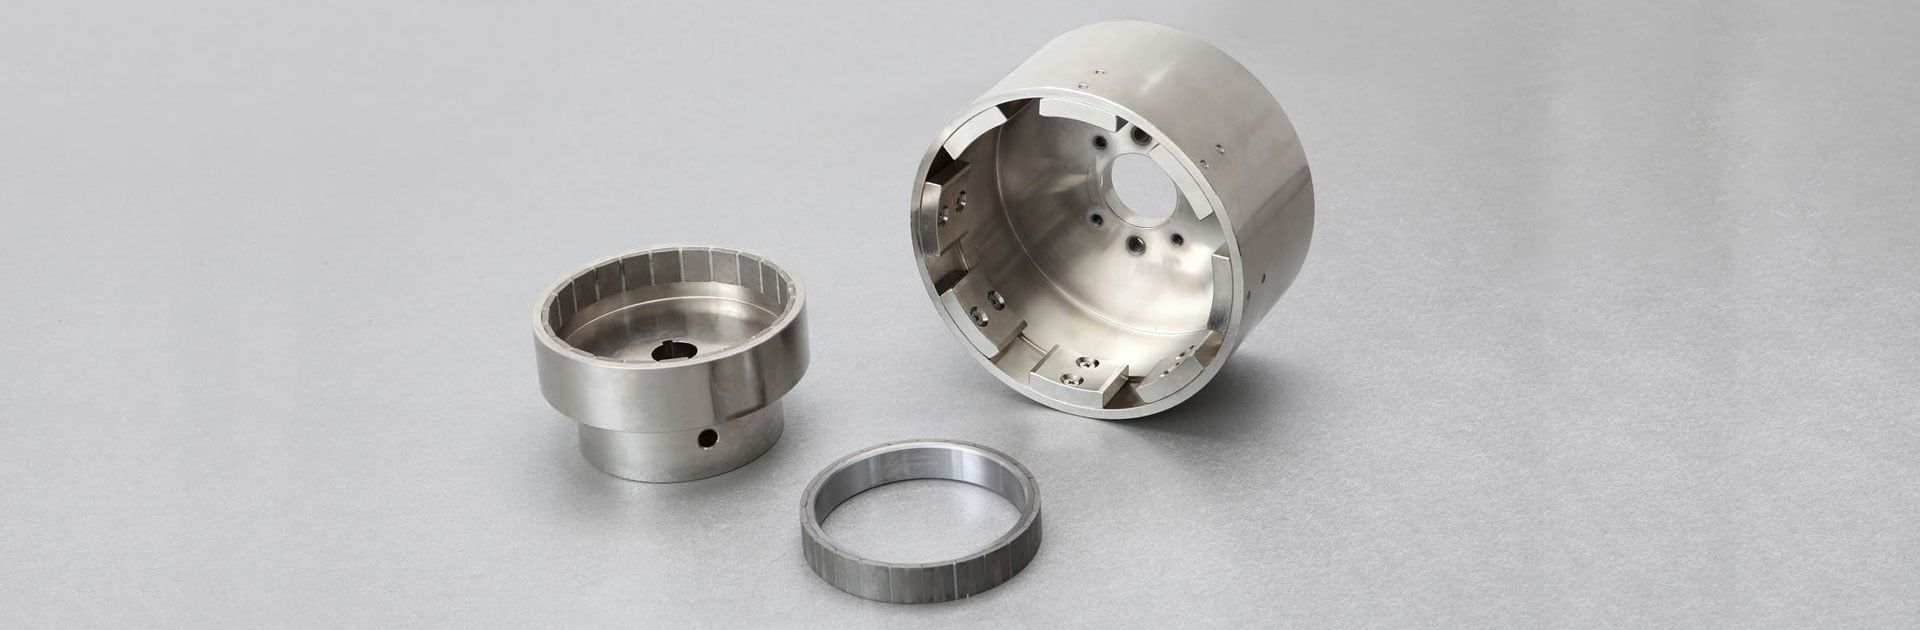 Magneti,-Elektro-magneti,-Magnetne-mize,-Robotska-prijemala-DSC00844a